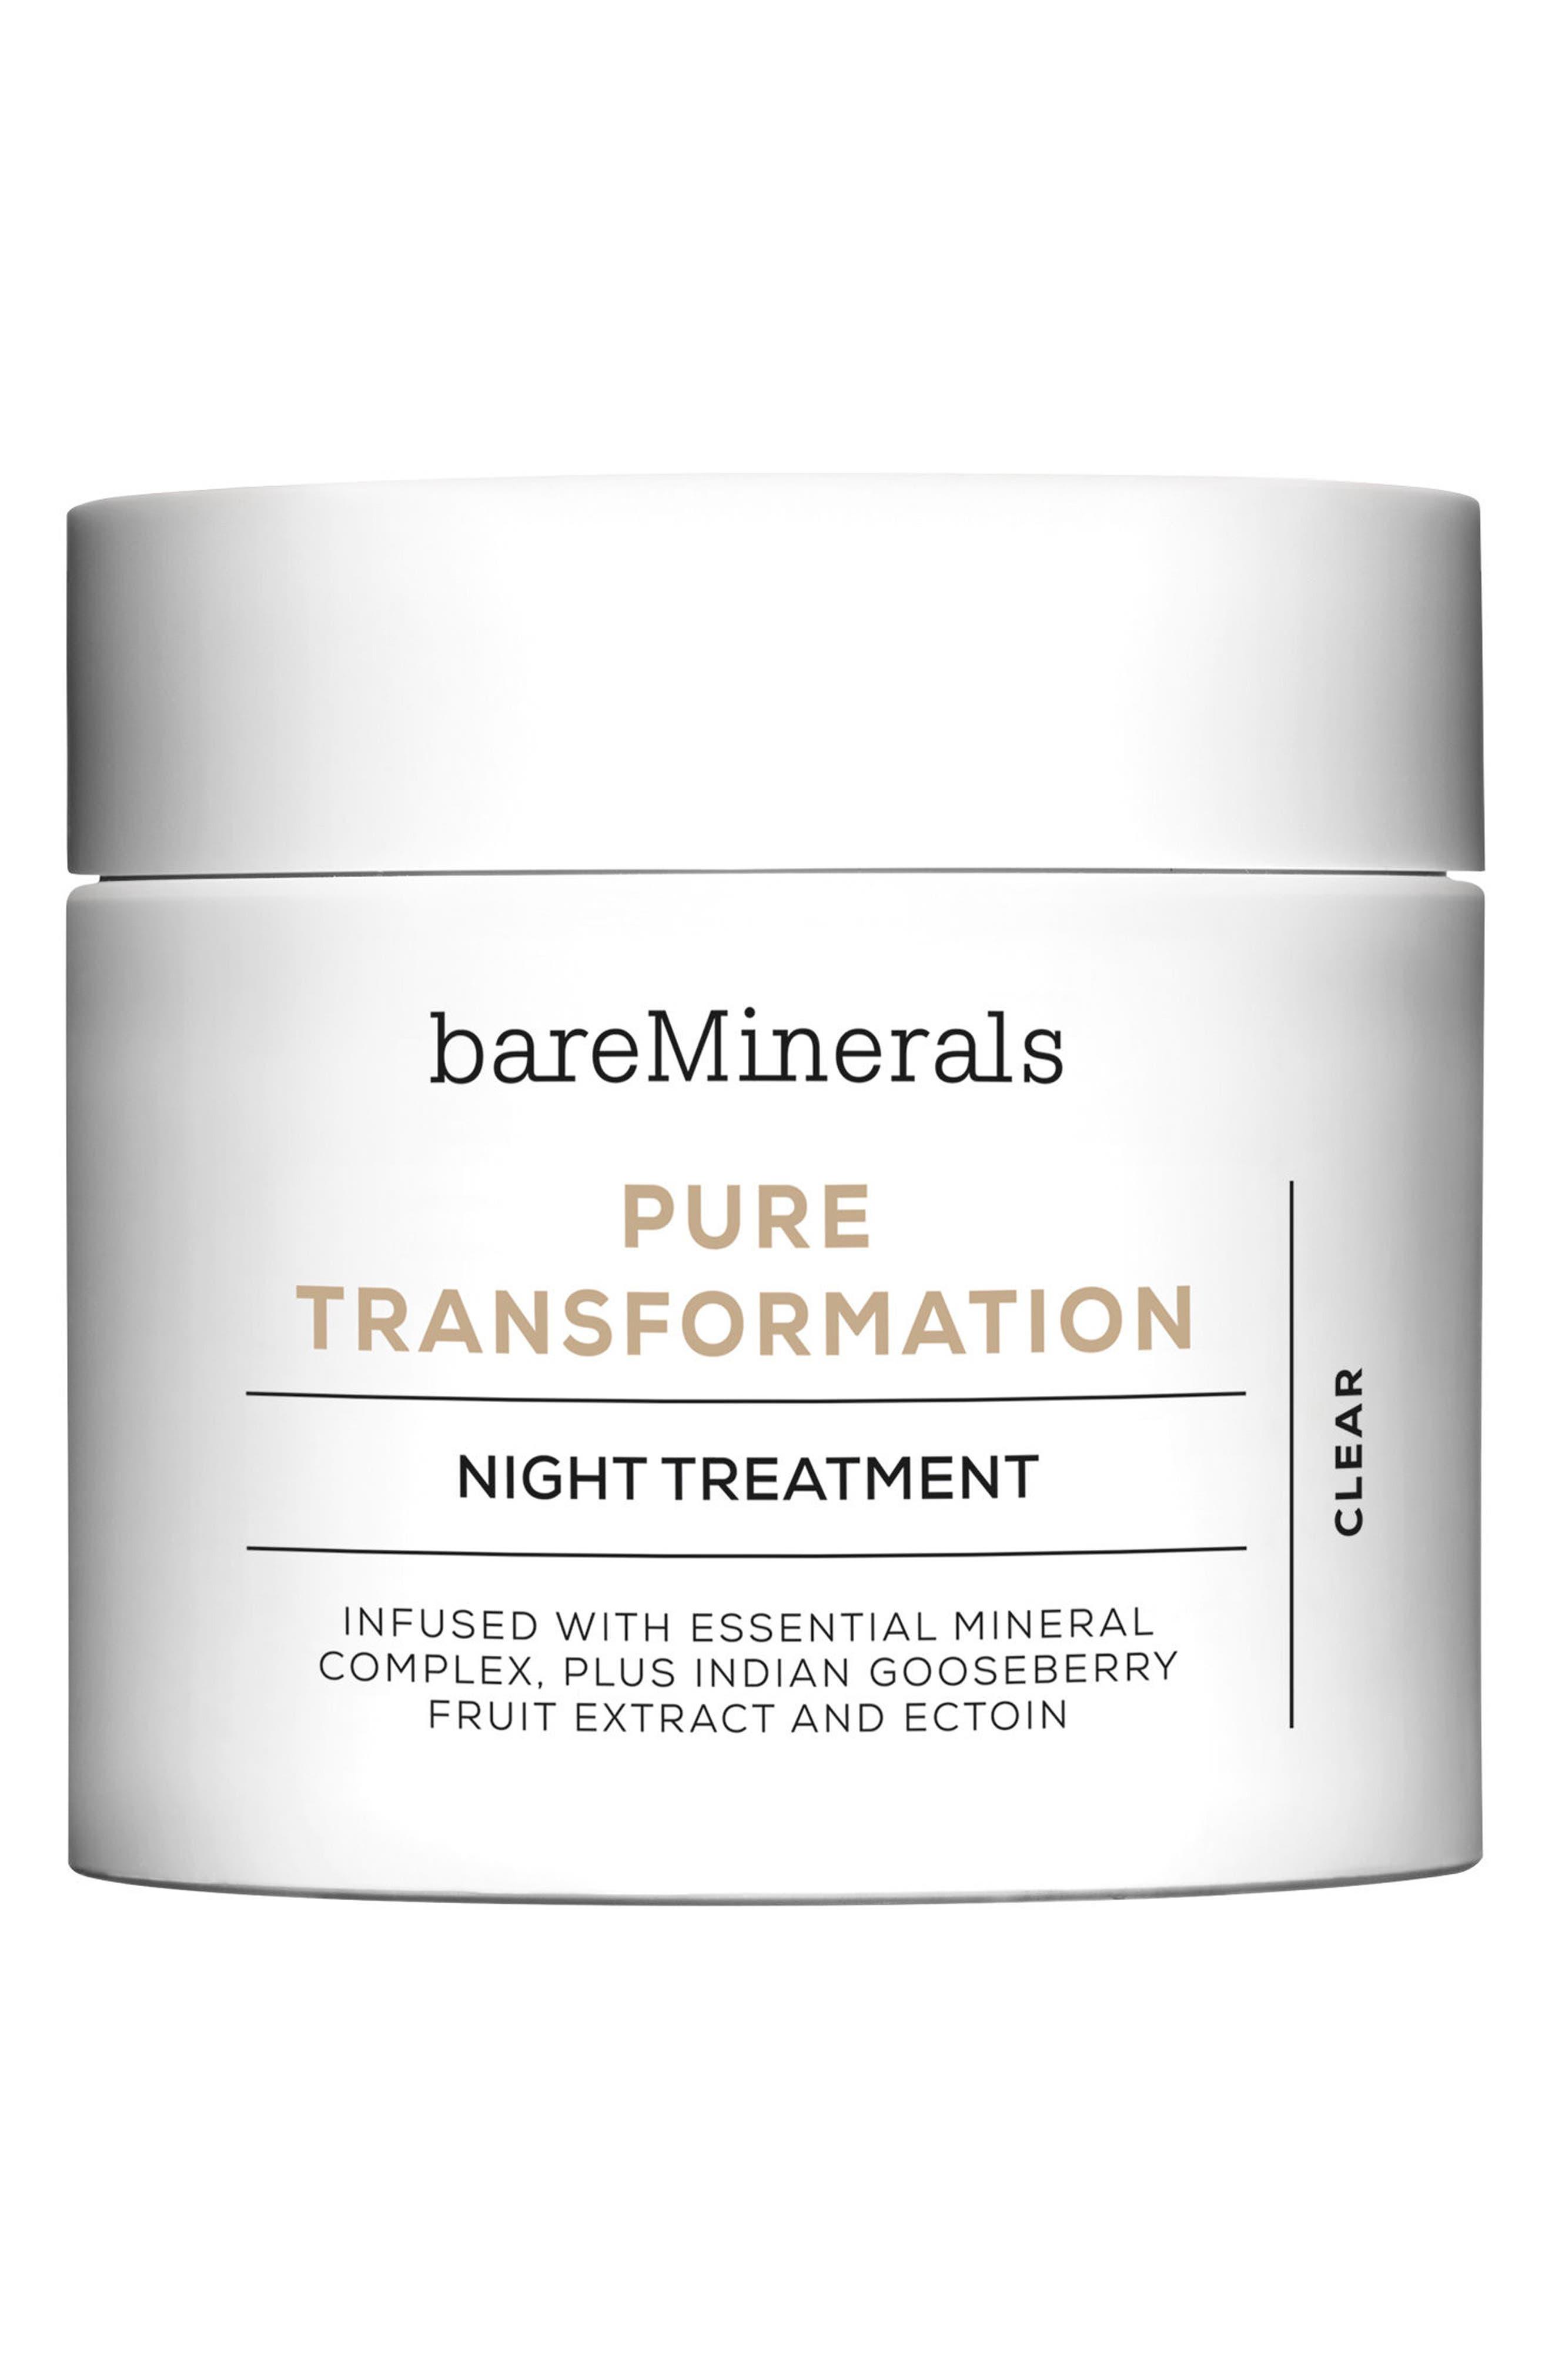 Skinsorials Pure Transformation Night Treatment,                             Main thumbnail 1, color,                             NO COLOR